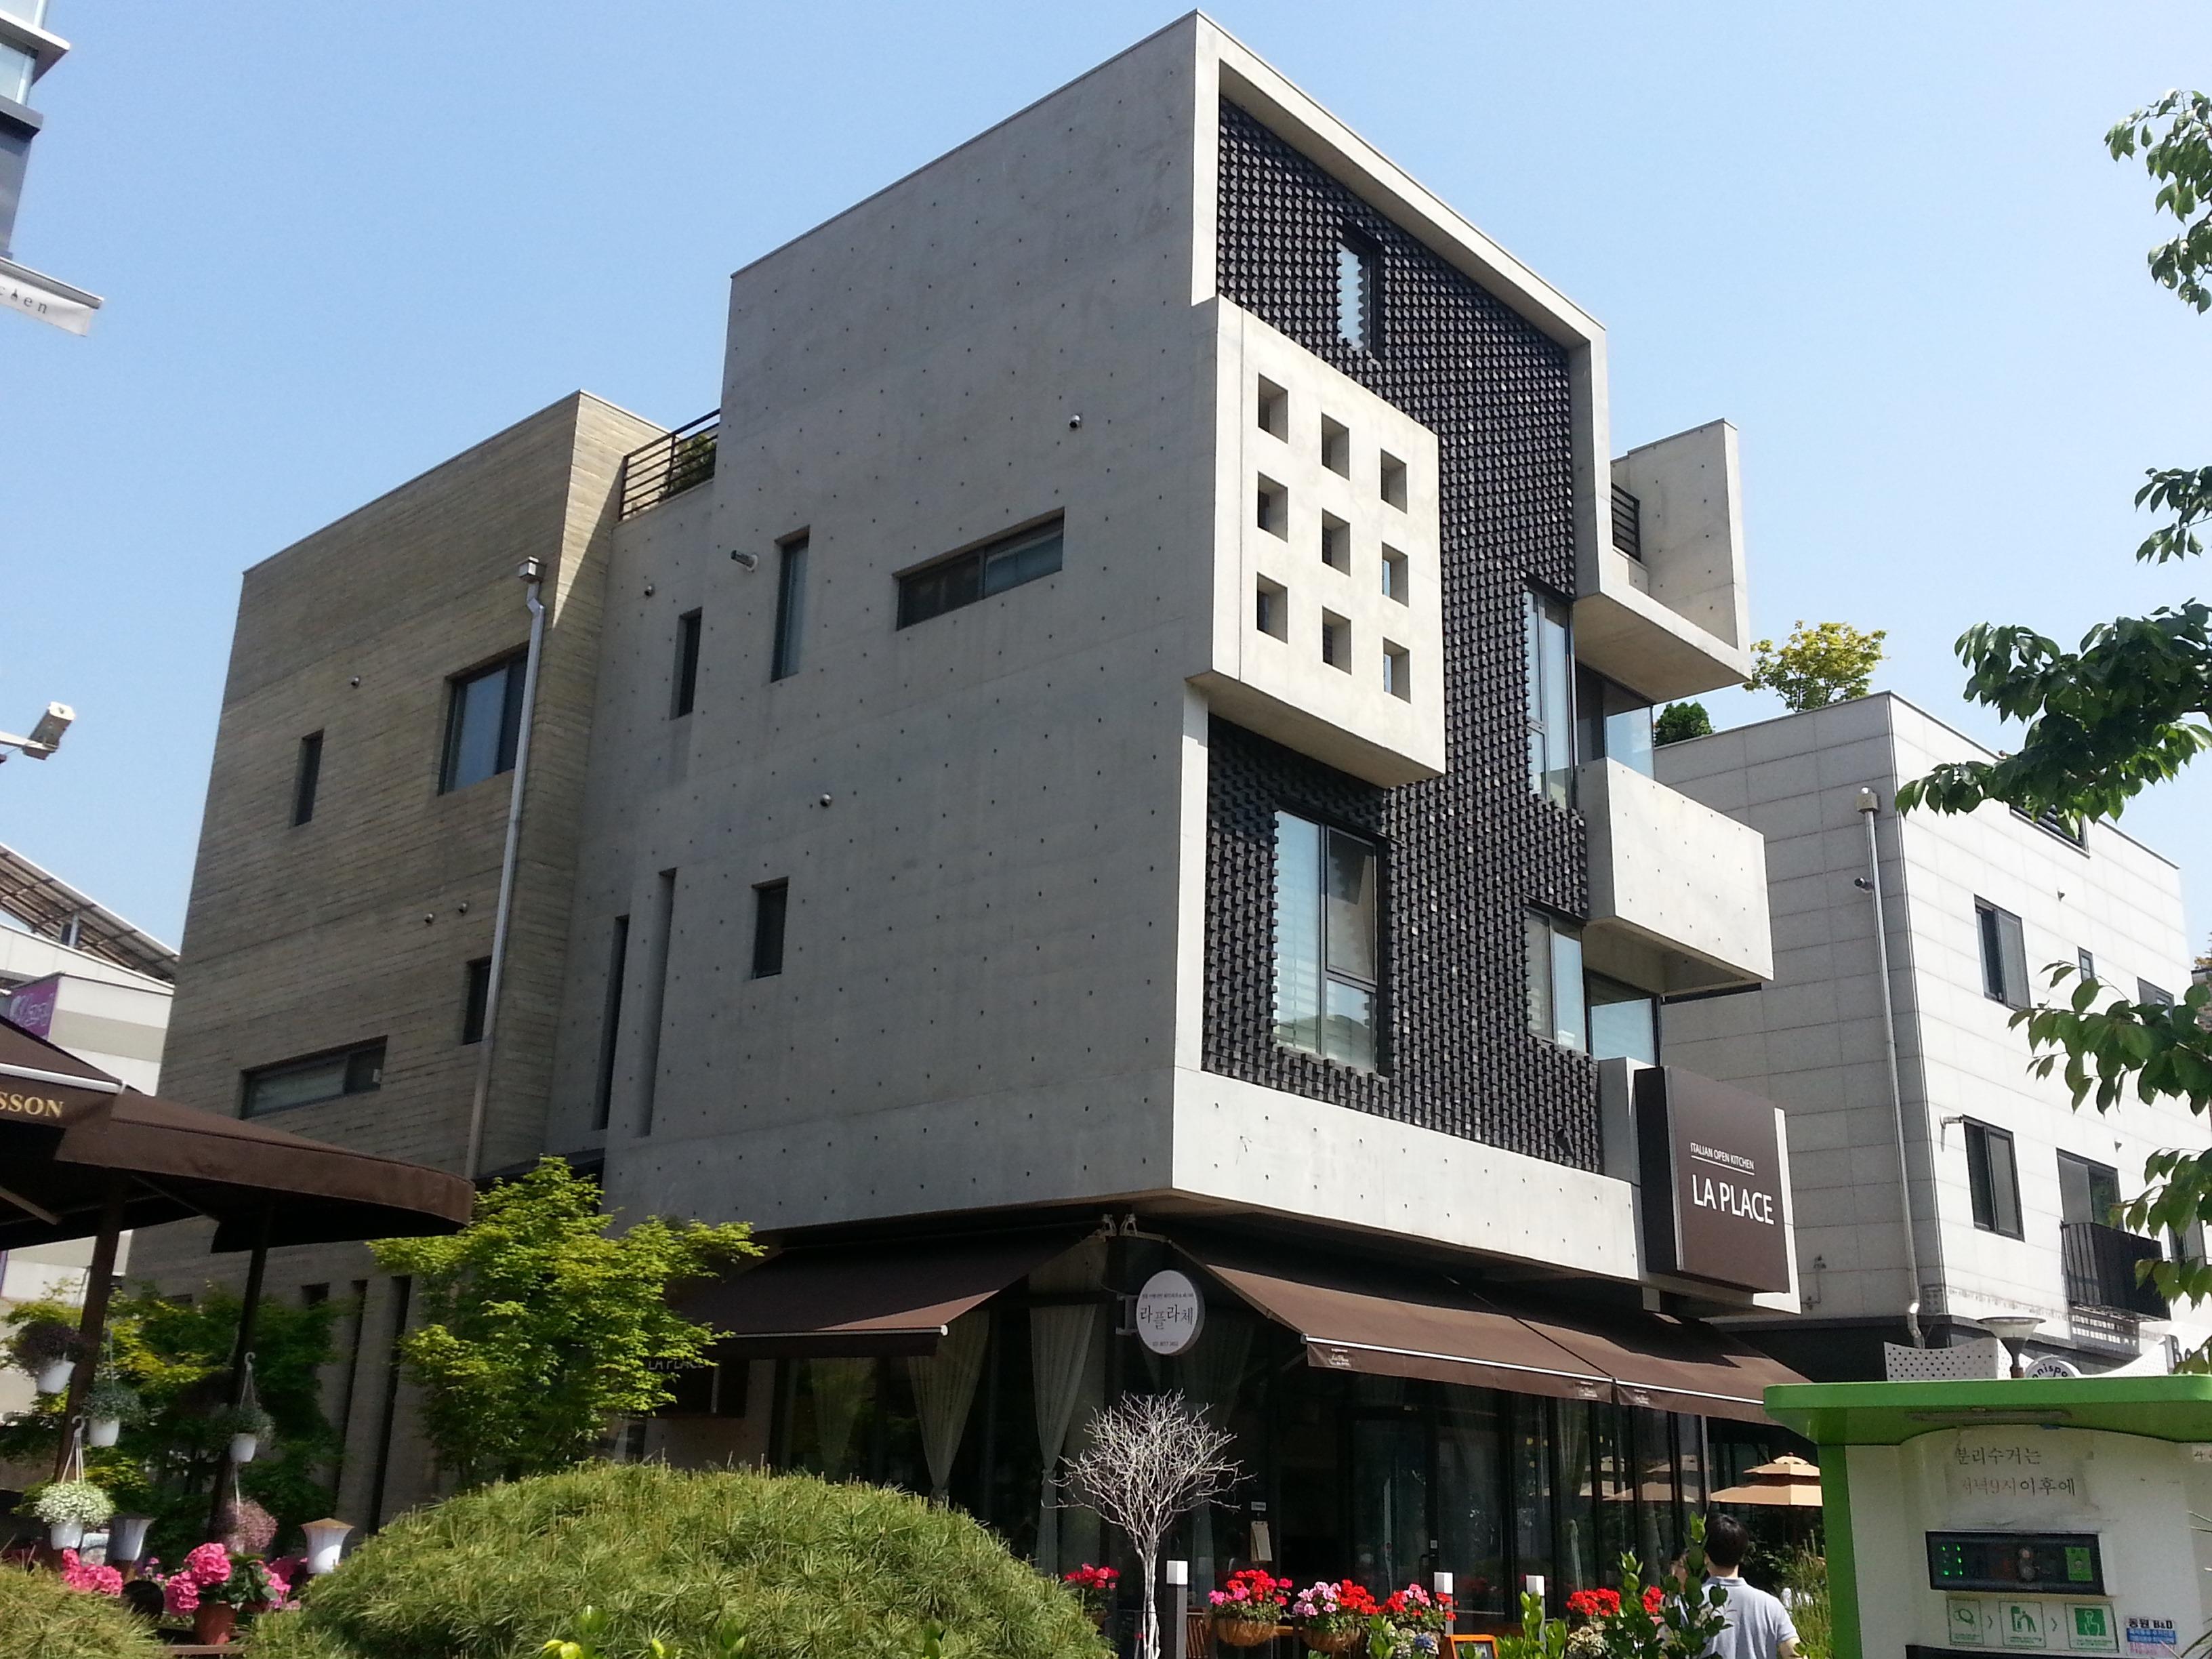 Images gratuites architecture villa maison fen tre b timent ville fa ade propri t for Fenetre villa